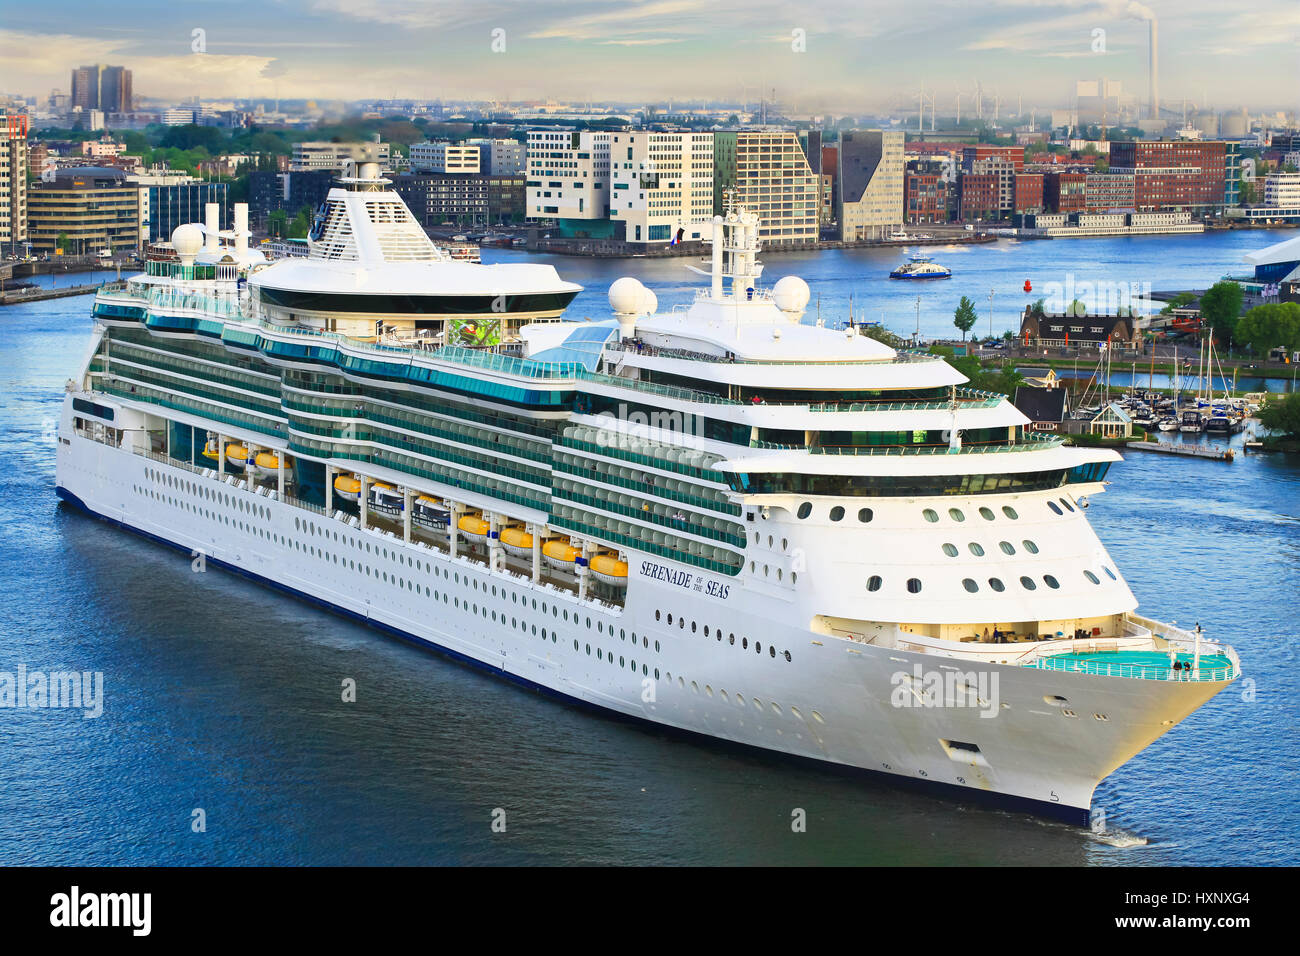 royal caribbean cruise ship serenade of the seas heading to cruise